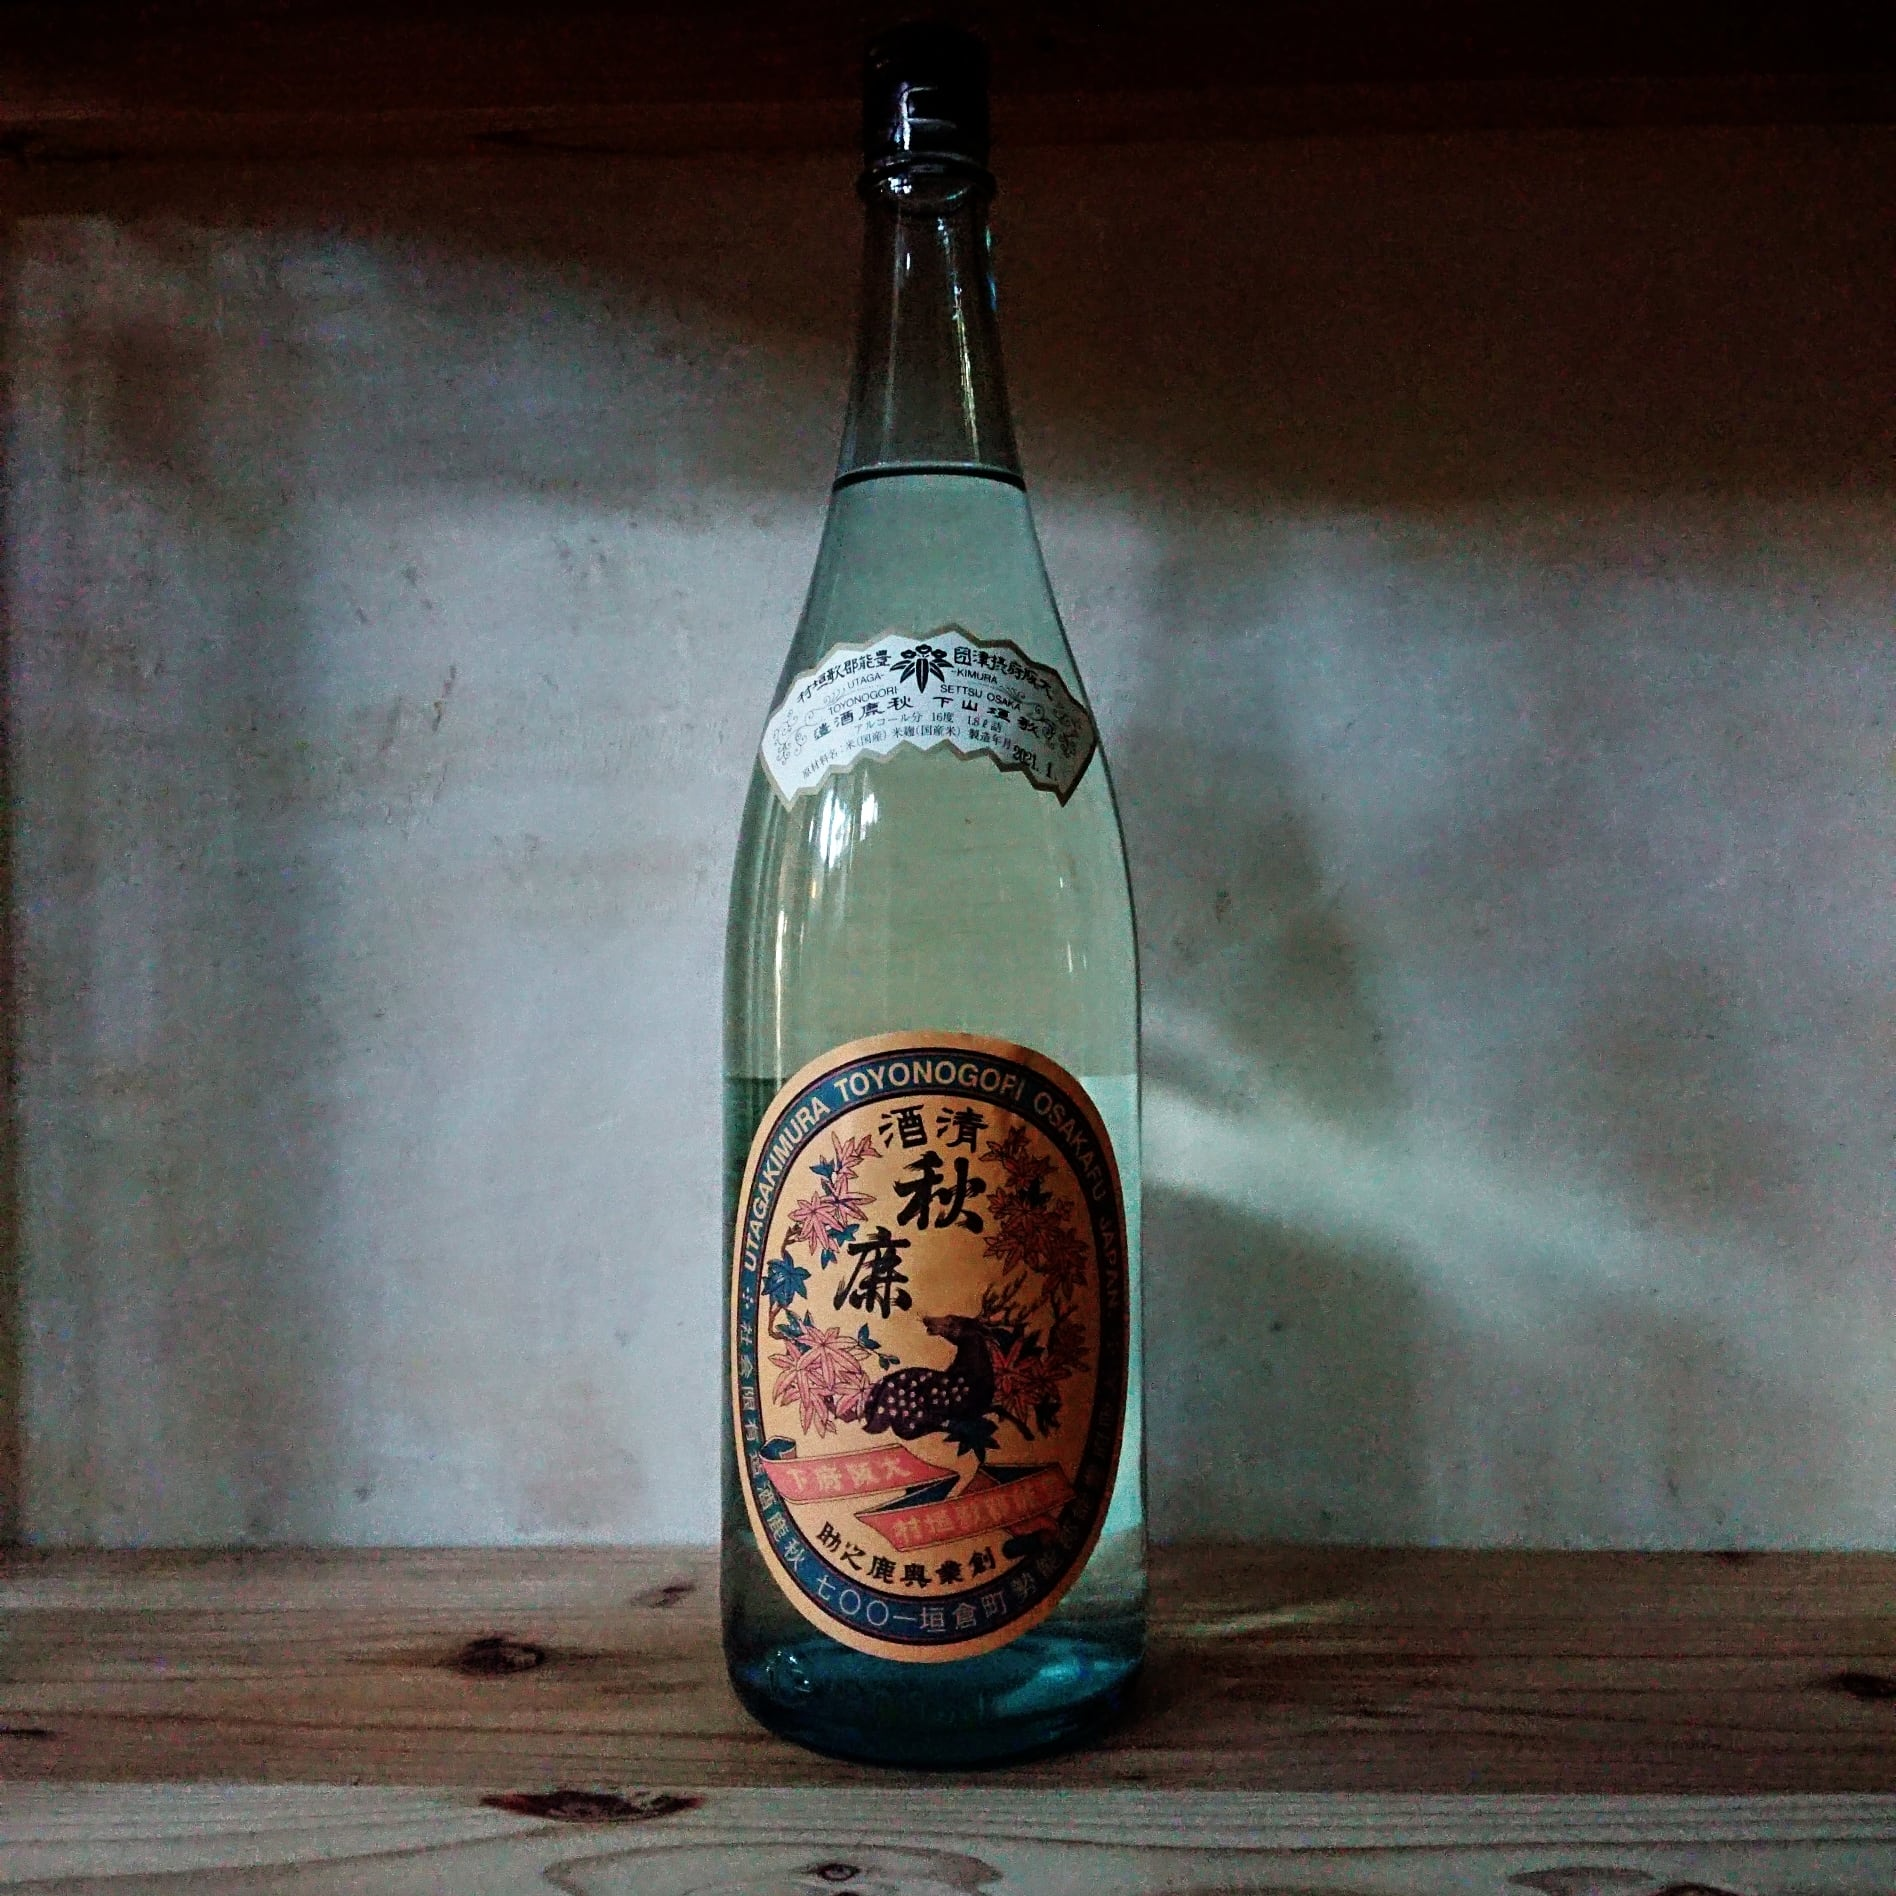 秋鹿 純米大吟醸 復古版ラベル 1.8L